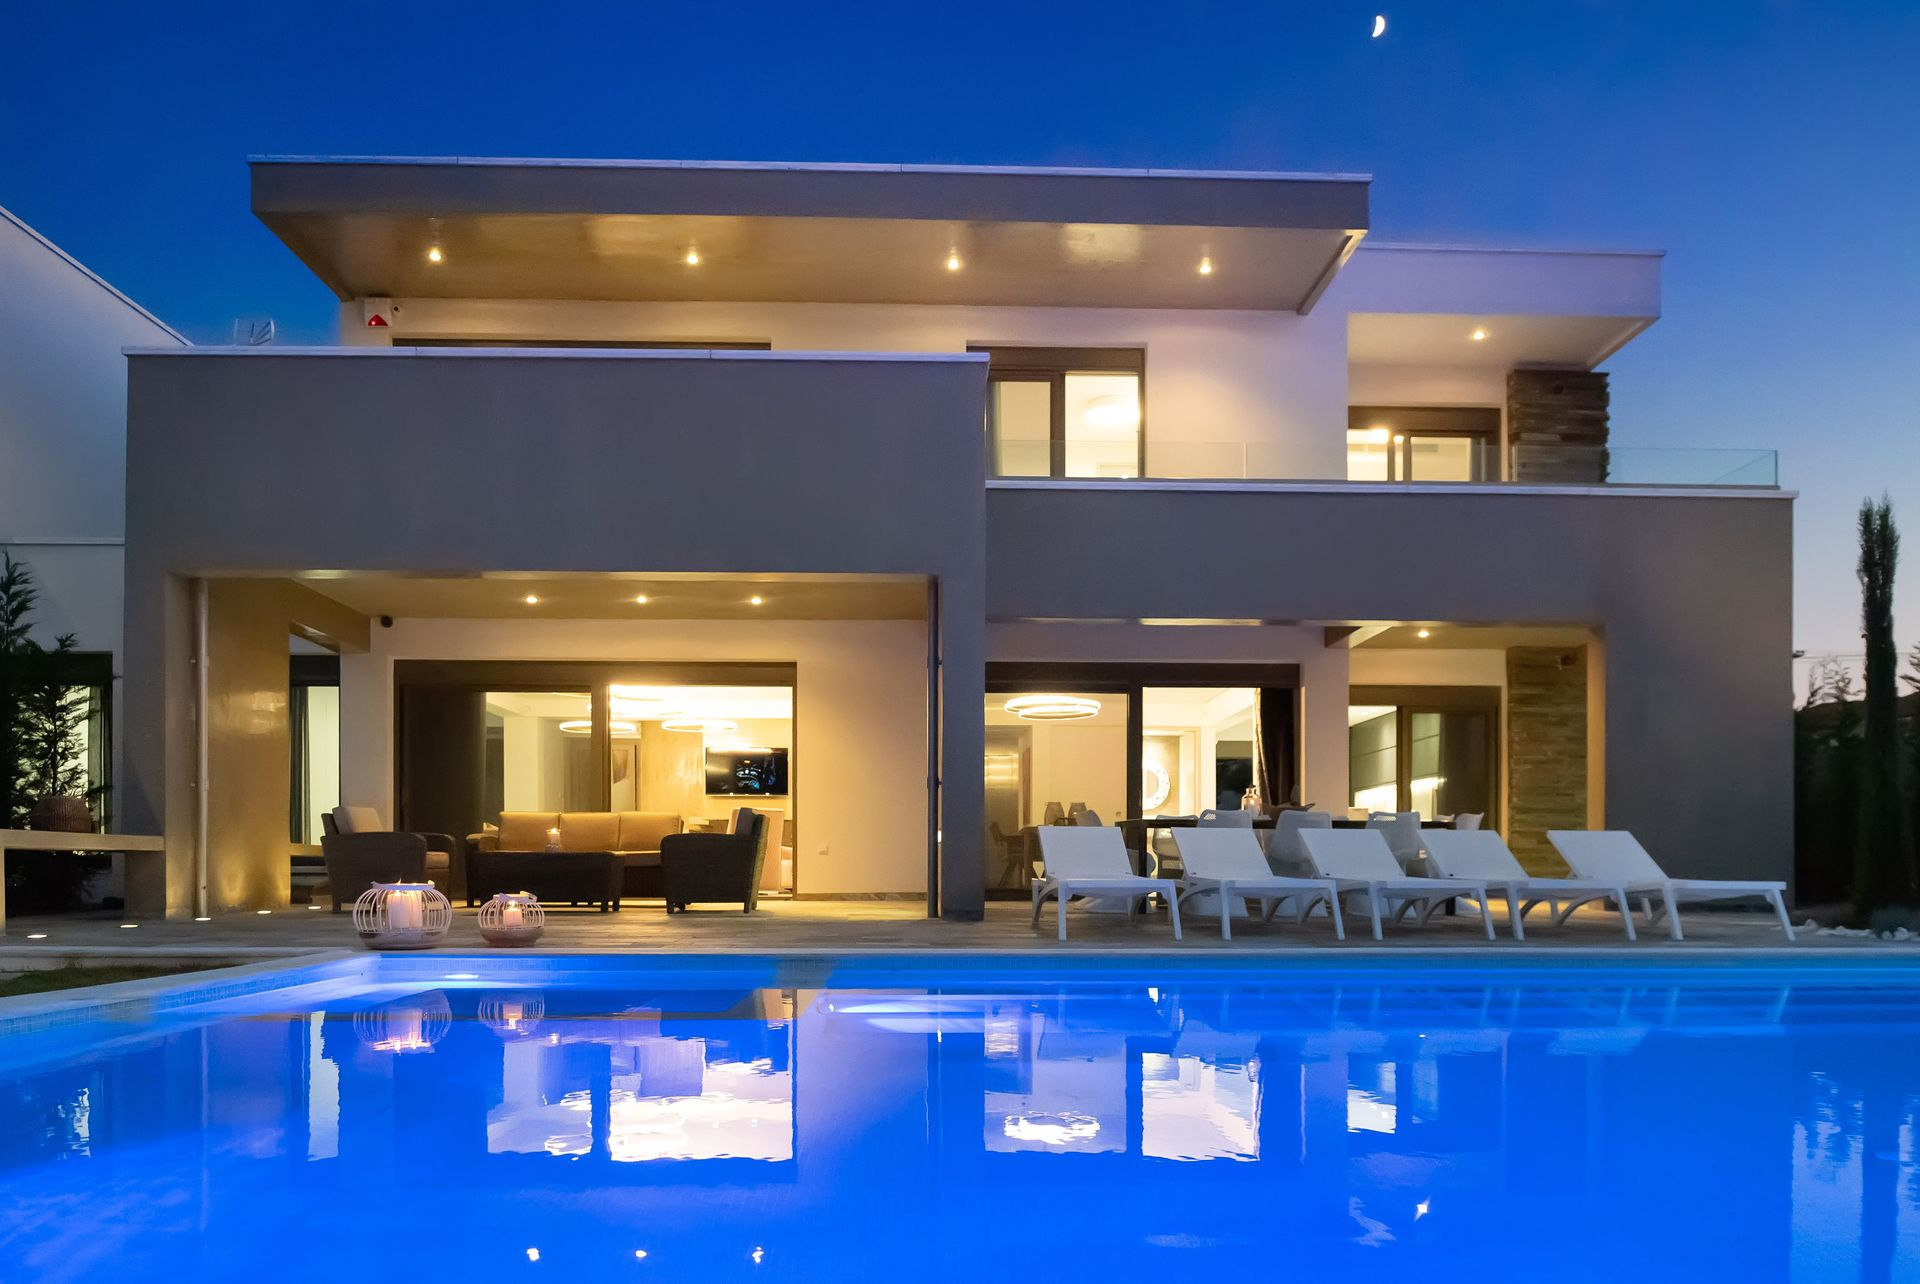 Kassandra Luxury Villas Chalkidiki - Πολύχρονο, Χαλκιδική ✦ 4 Ημέρες (3 Διανυκτερεύσεις) ✦ έως 8 άτομα ✦ Χωρίς Πρωινό ✦ 13/08/2021 έως 31/08/2021 ✦ Κοντά σε παραλία!